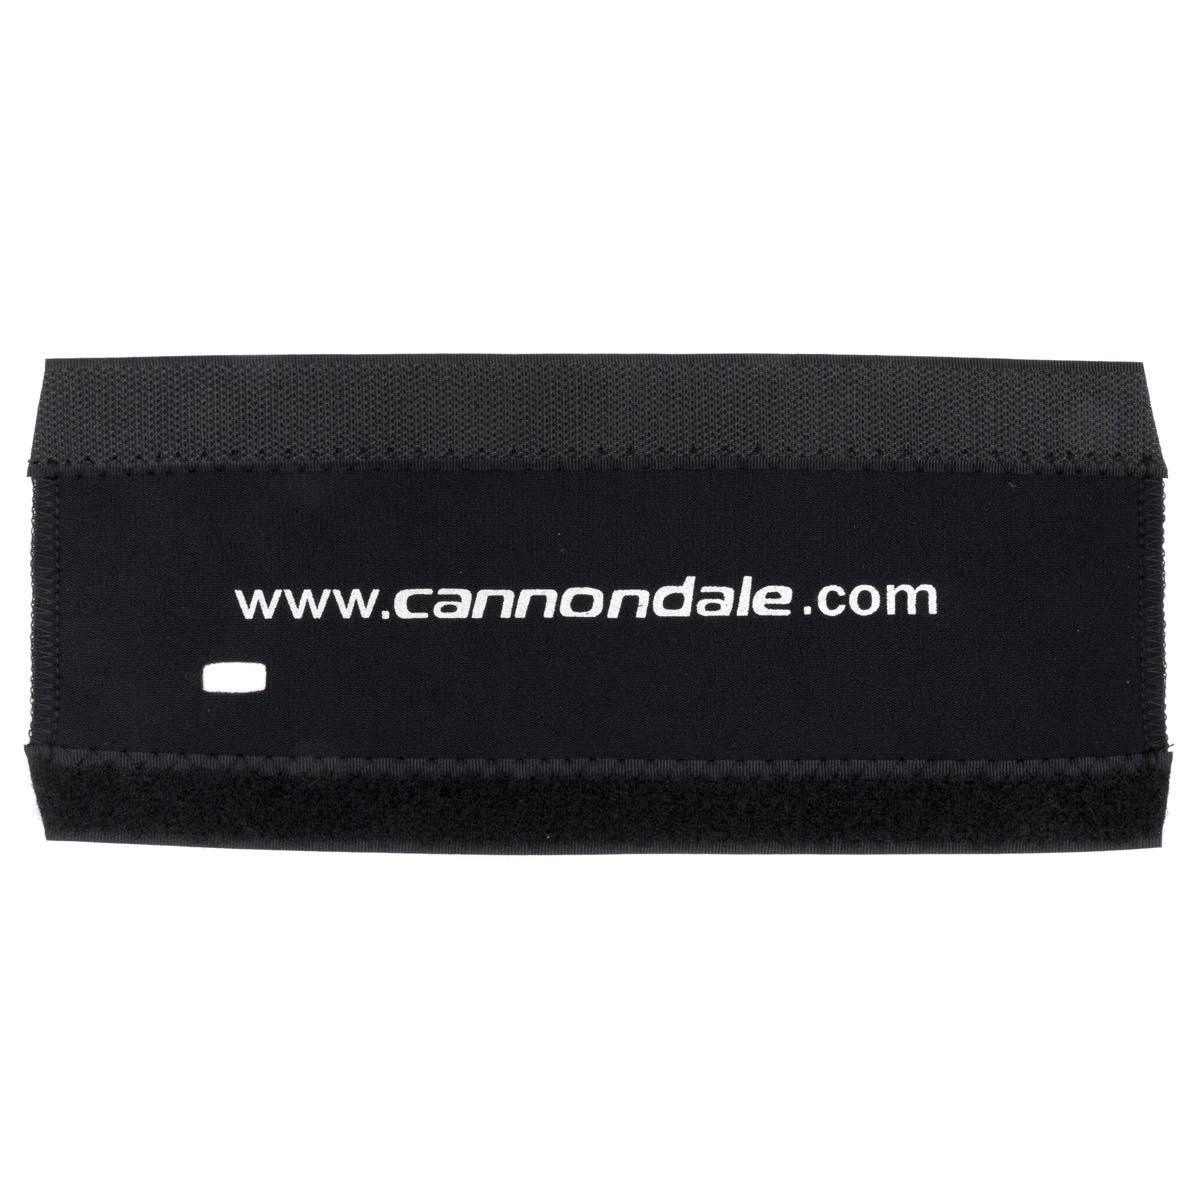 Stelbeskyttelse Neopren Cannondale SM - KF024 | Misc. Mudguards